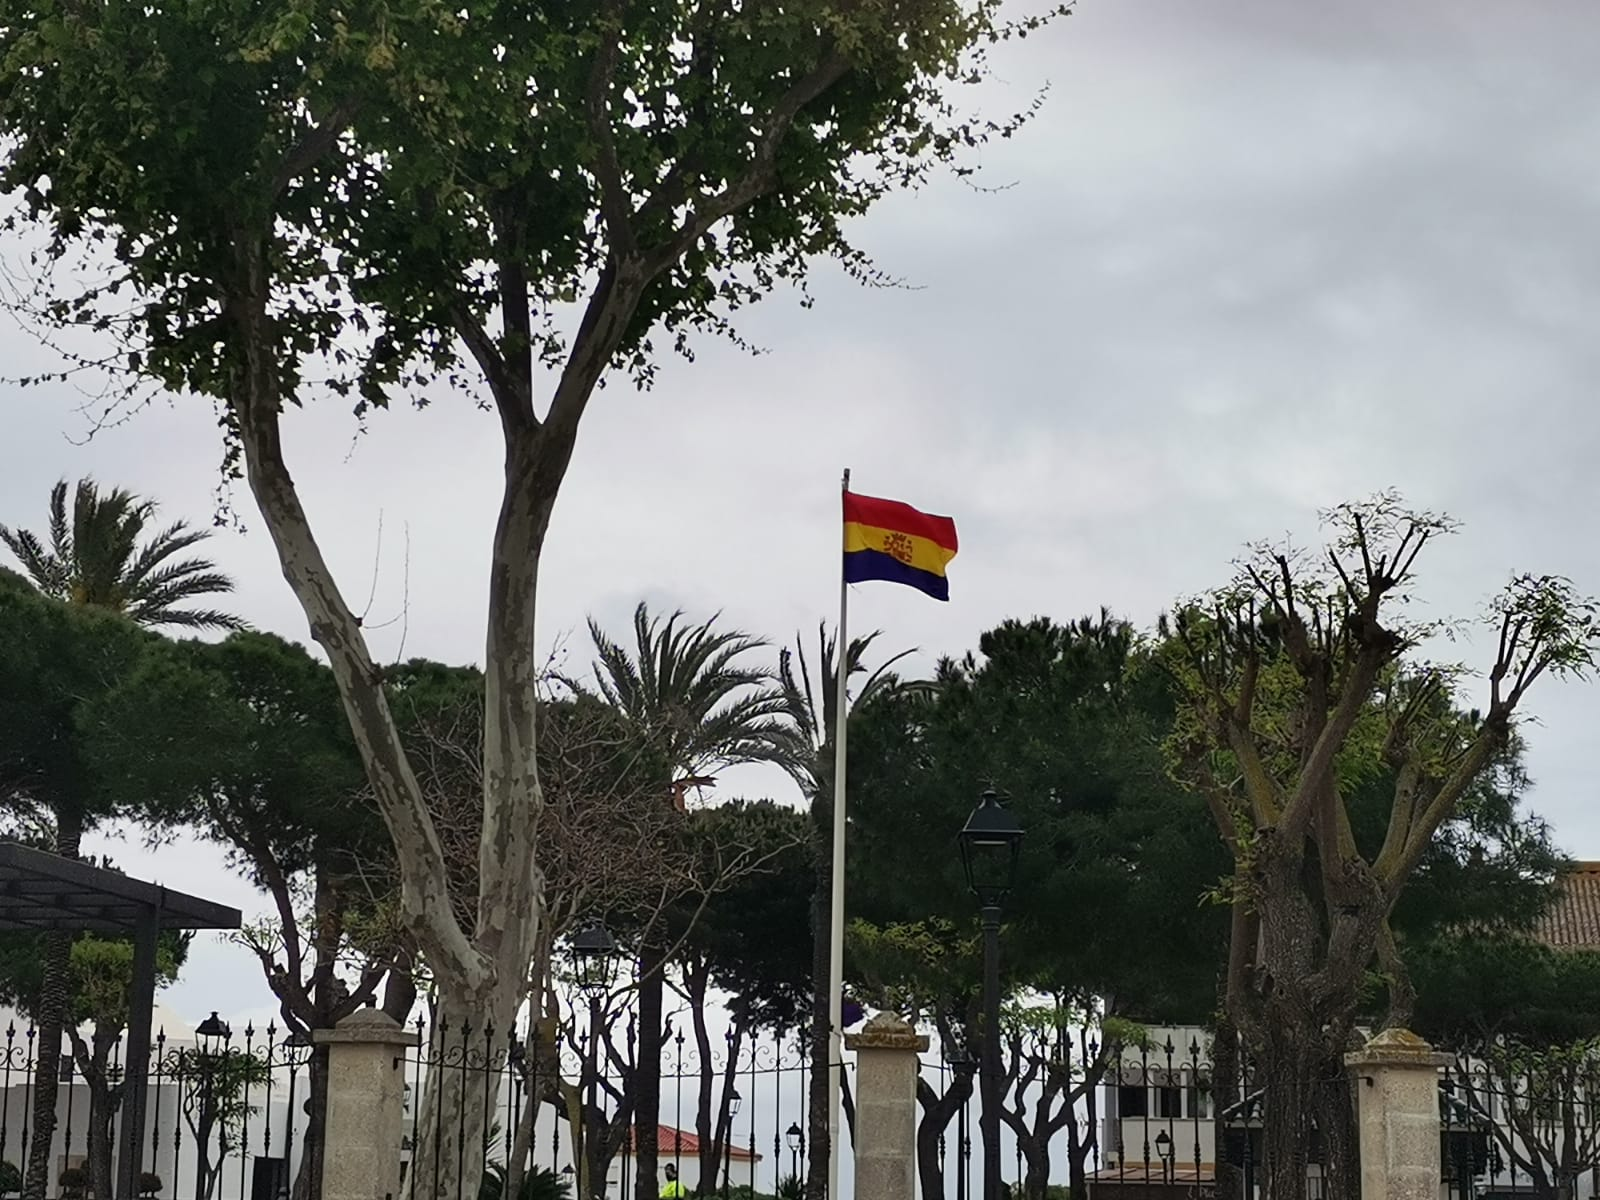 La bandera republicana ondea en la Alameda de San Roque. Martes, 13 de abril de 2021.